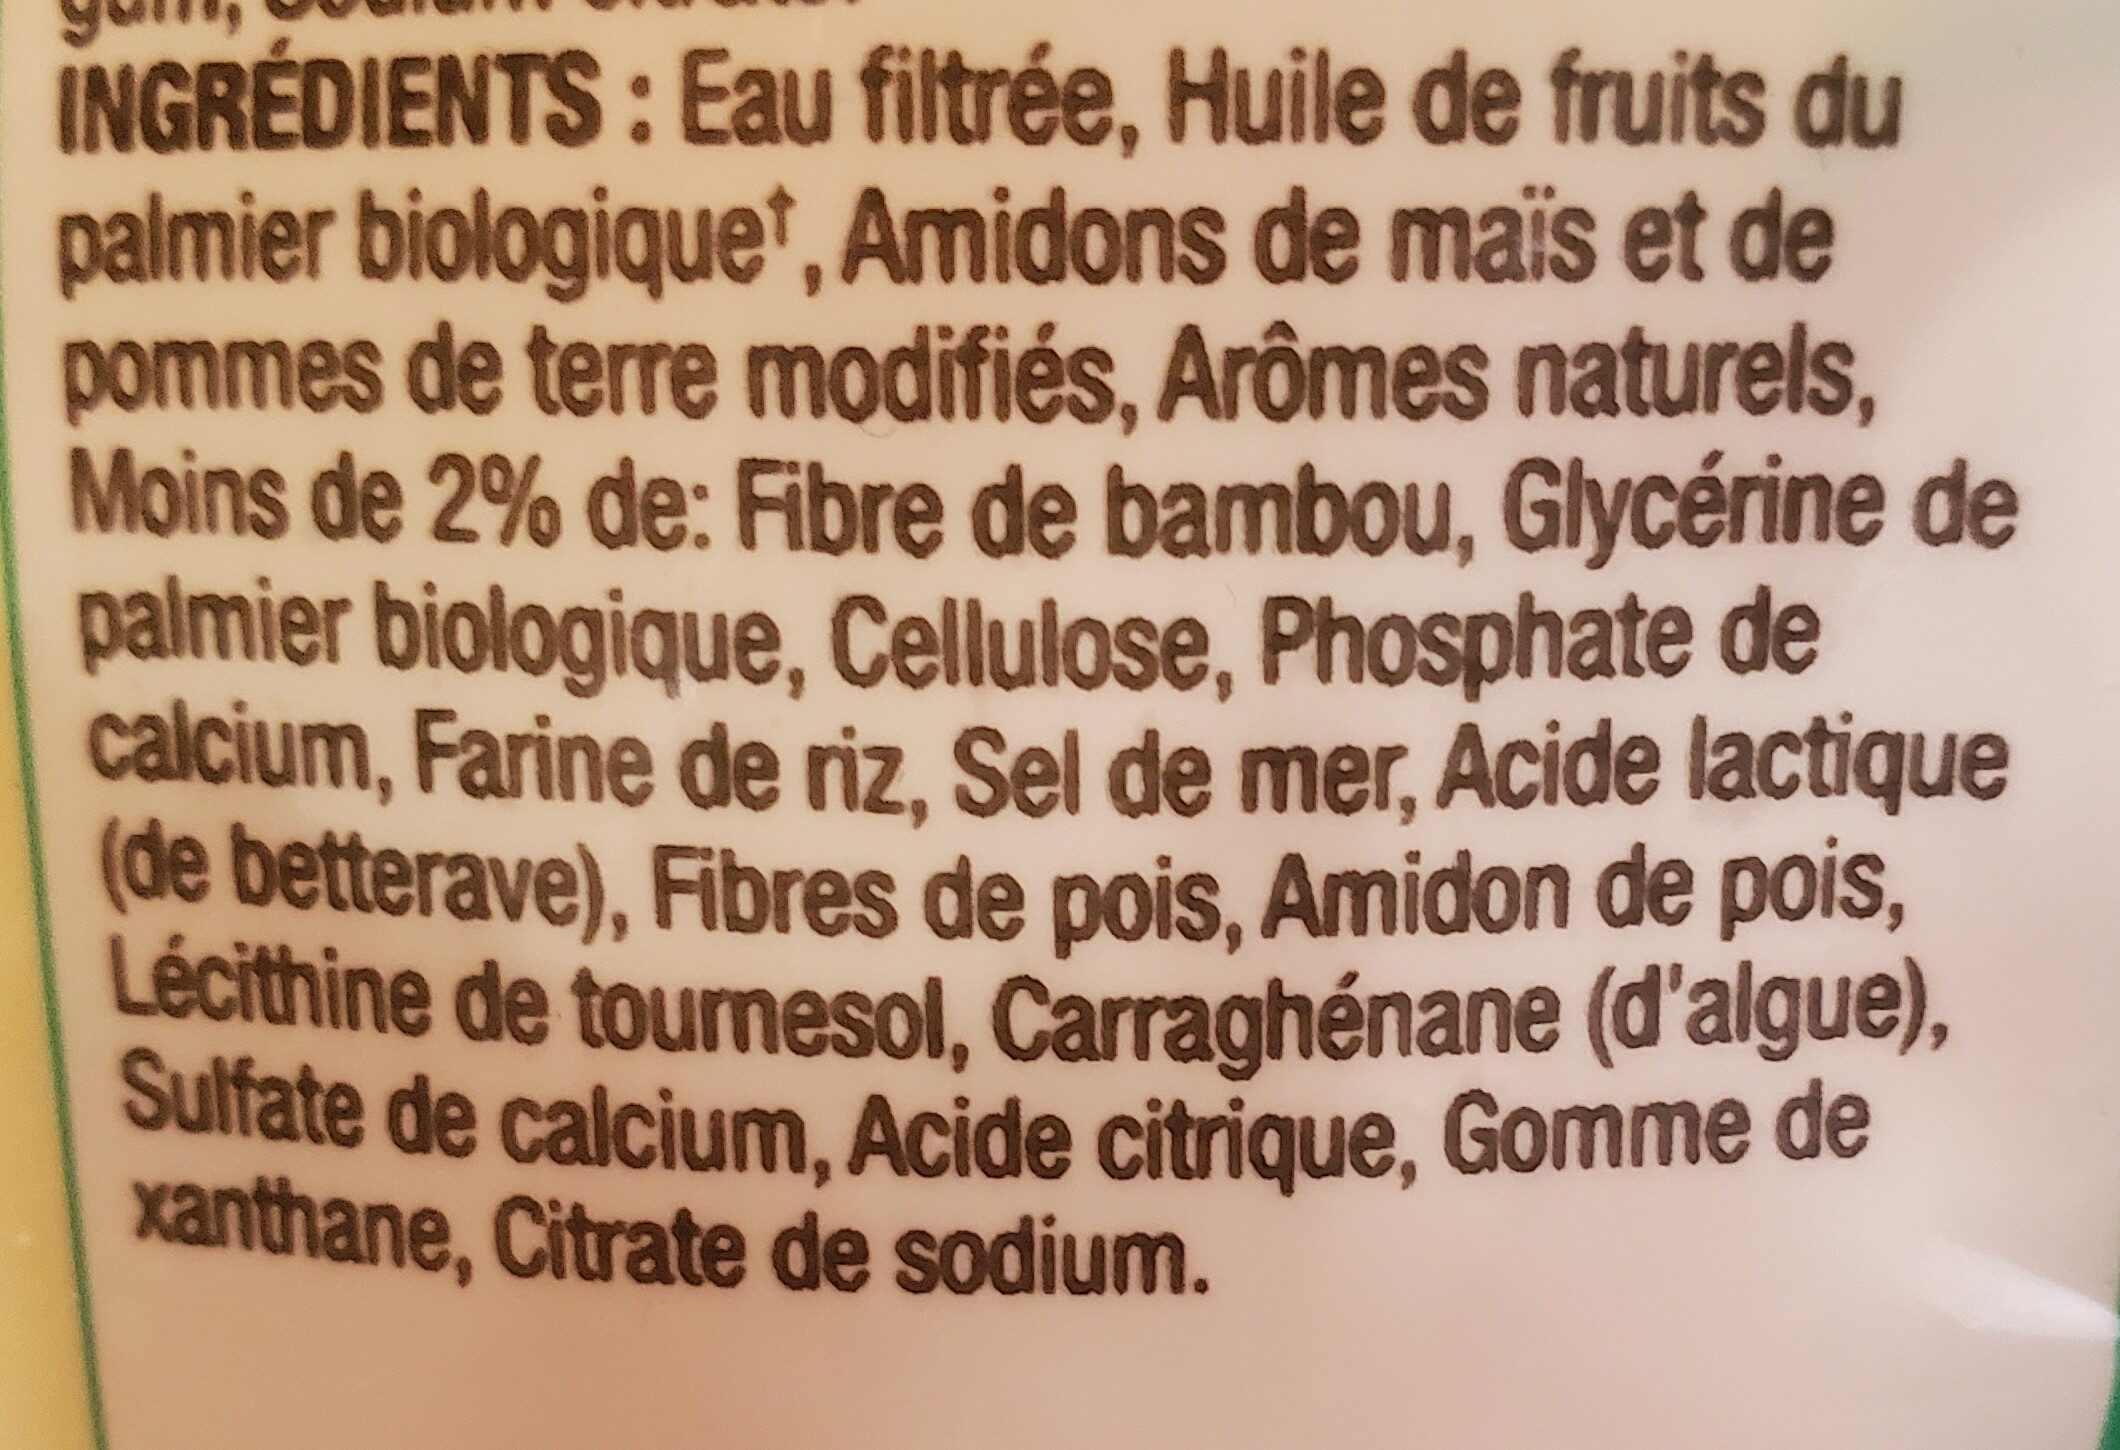 Mozzarella Shreds Dairy-Free - Ingredients - fr